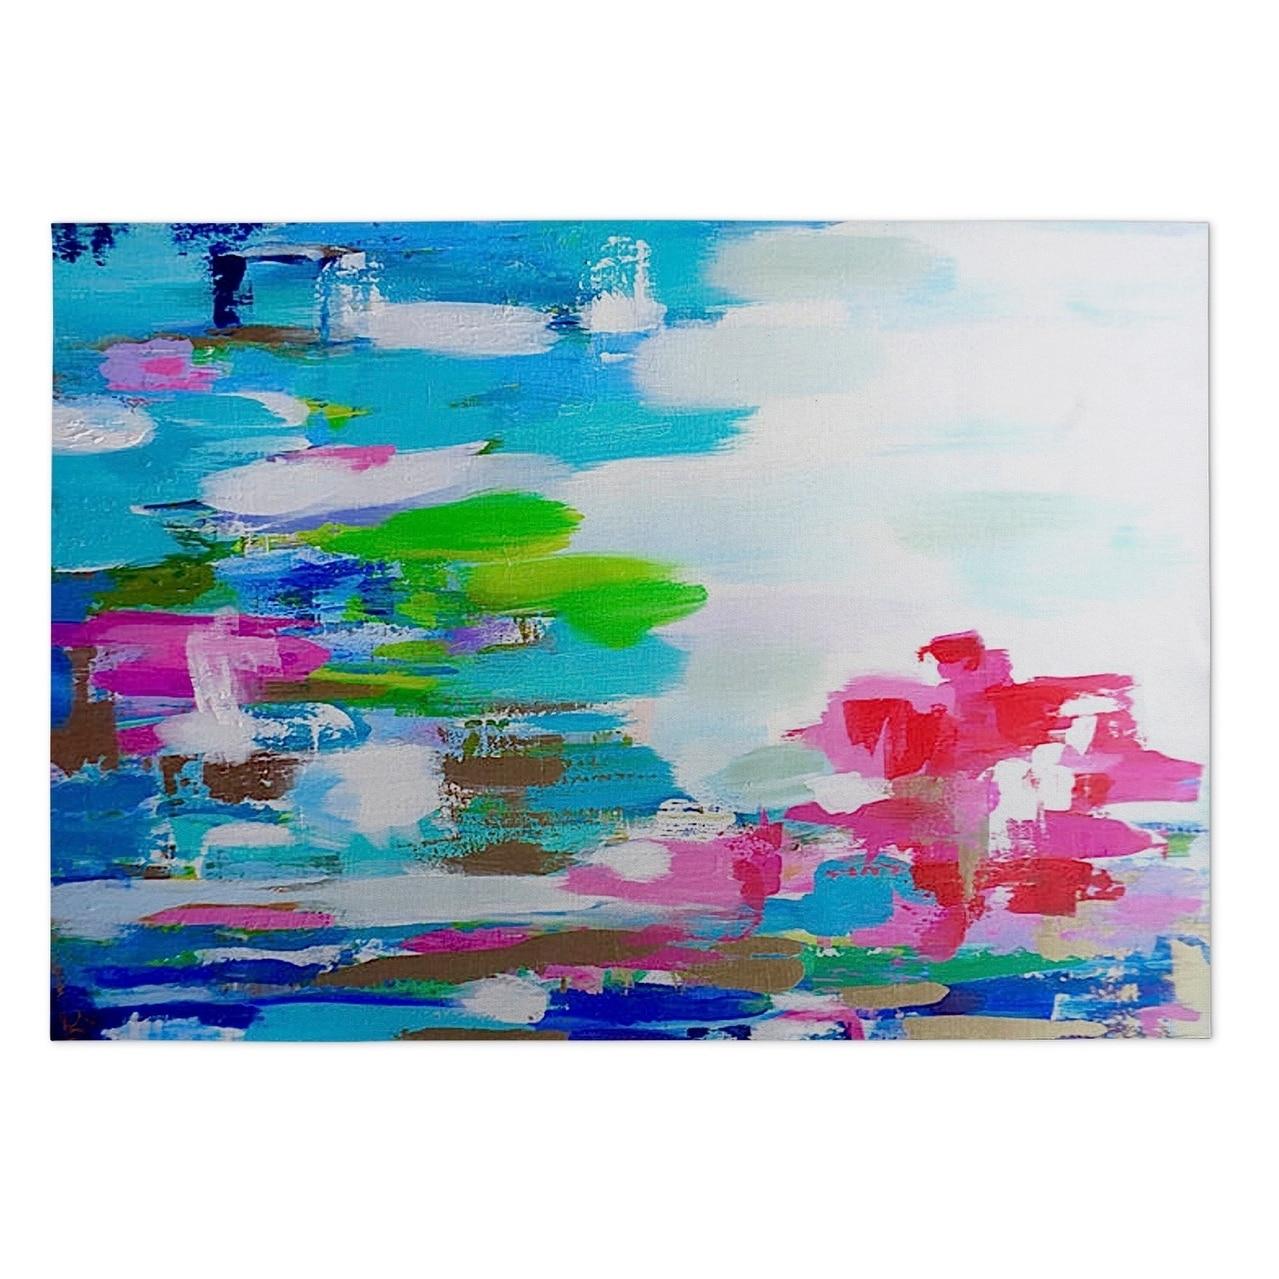 Kavka Designs Blue/ Green/ Pink Tomato Tamata ll 2' x 3' Indoor/ Outdoor Floor Mat (Blue - N/A - Modern & Contemporary)